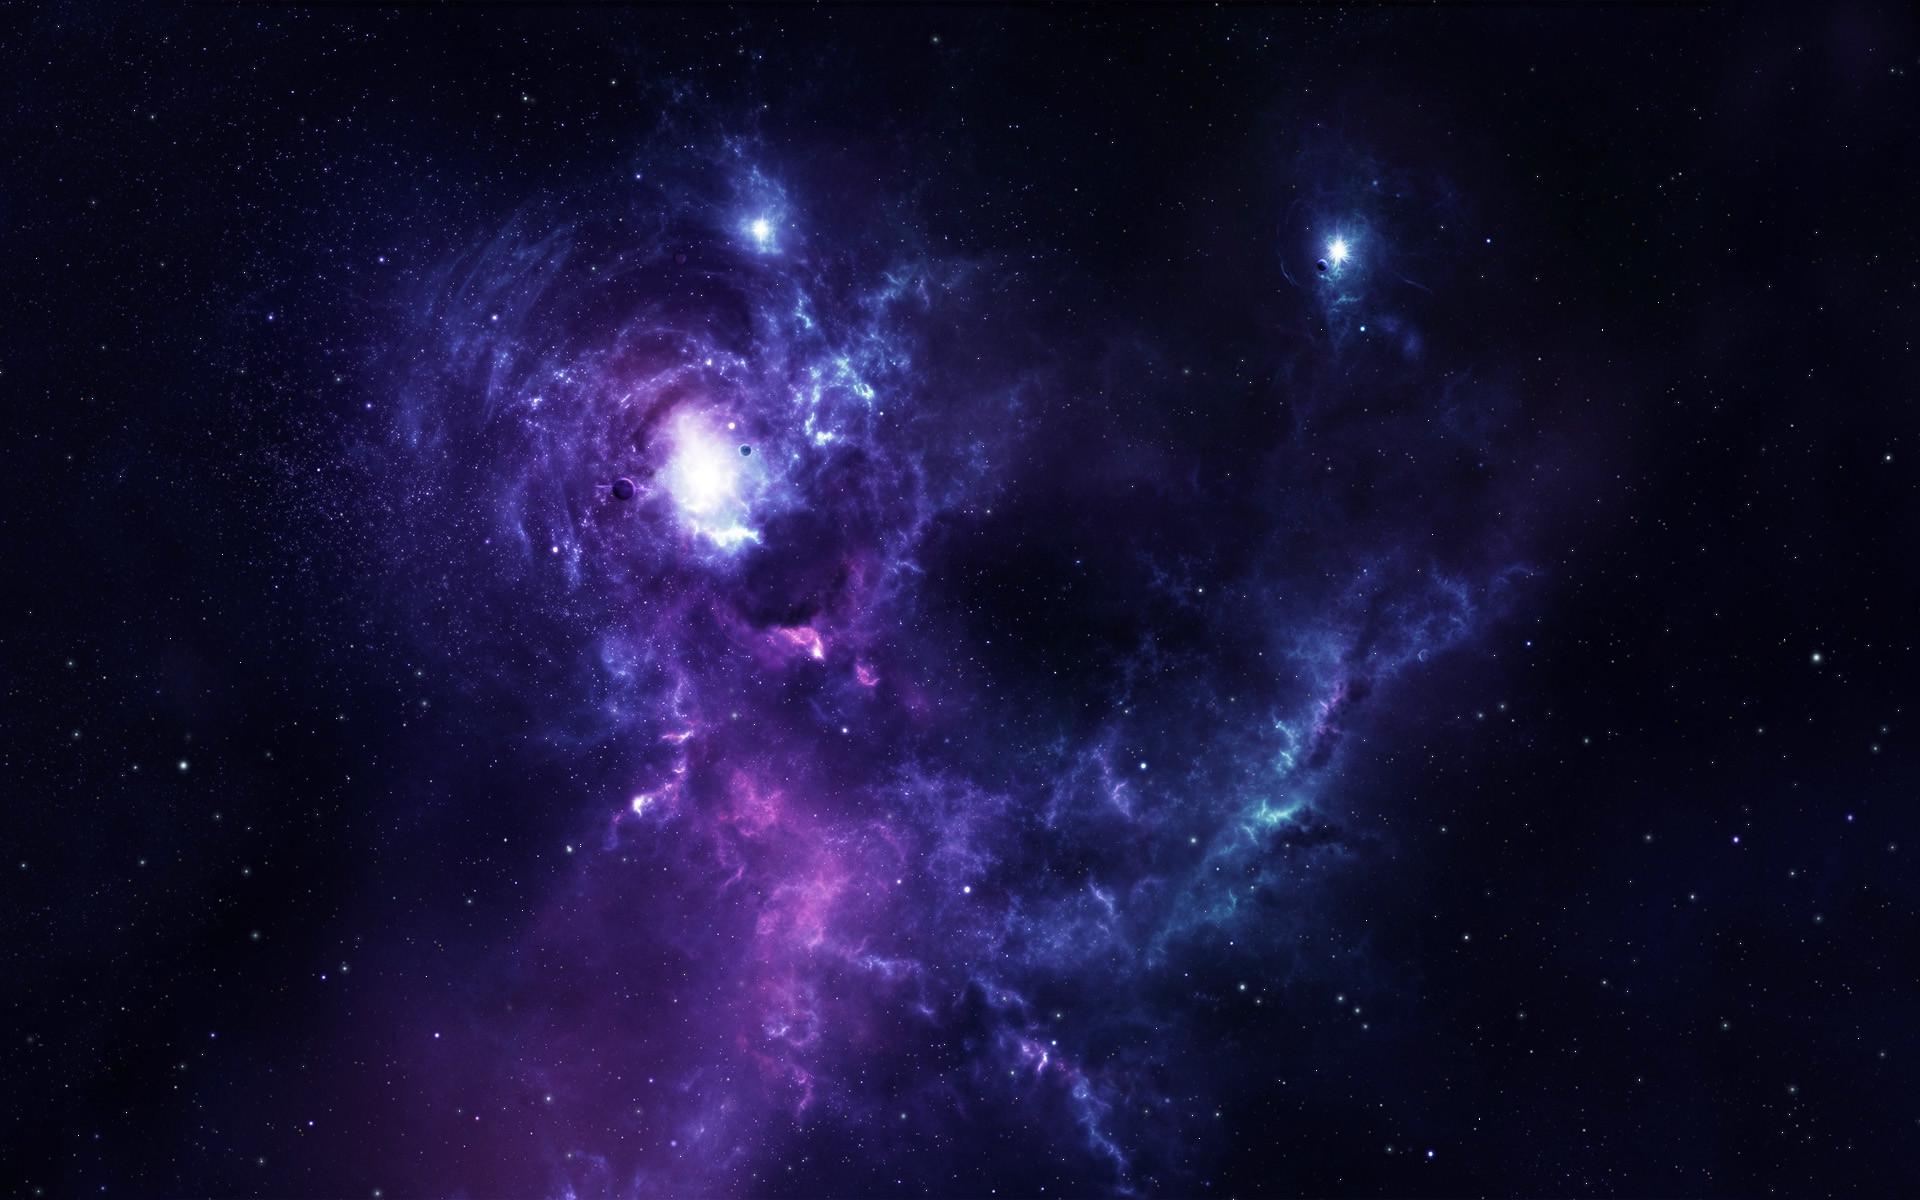 Space Nebula HD Wallpaper via Classy Bro